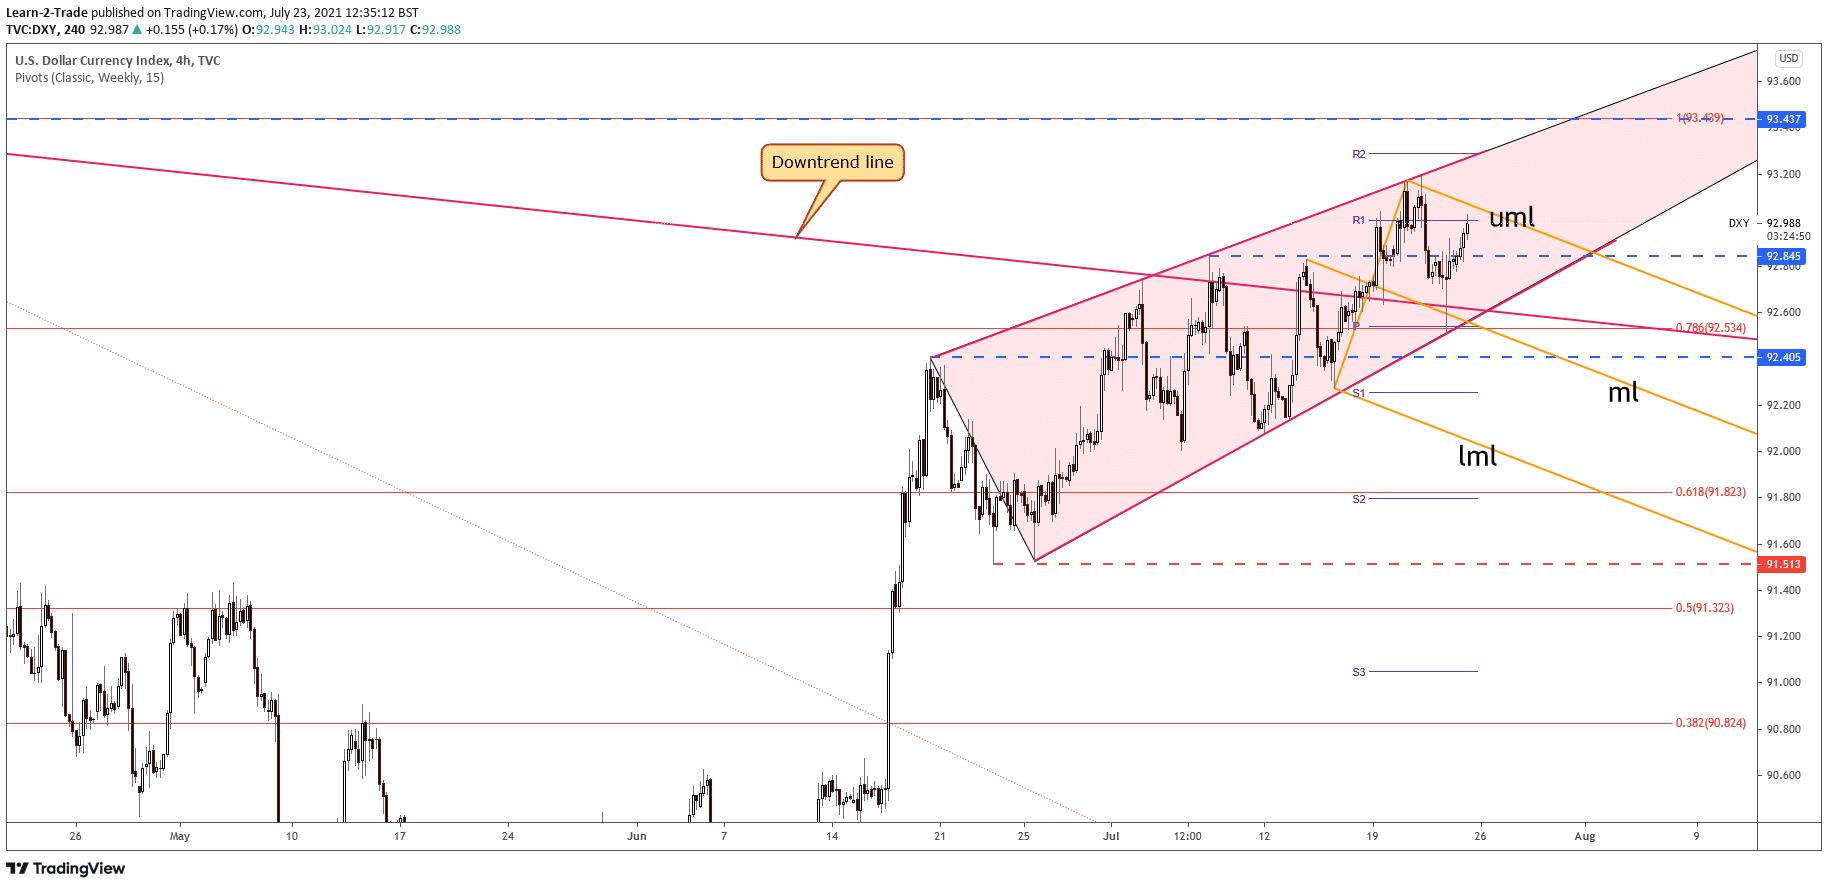 Dollar Index price rising wedge